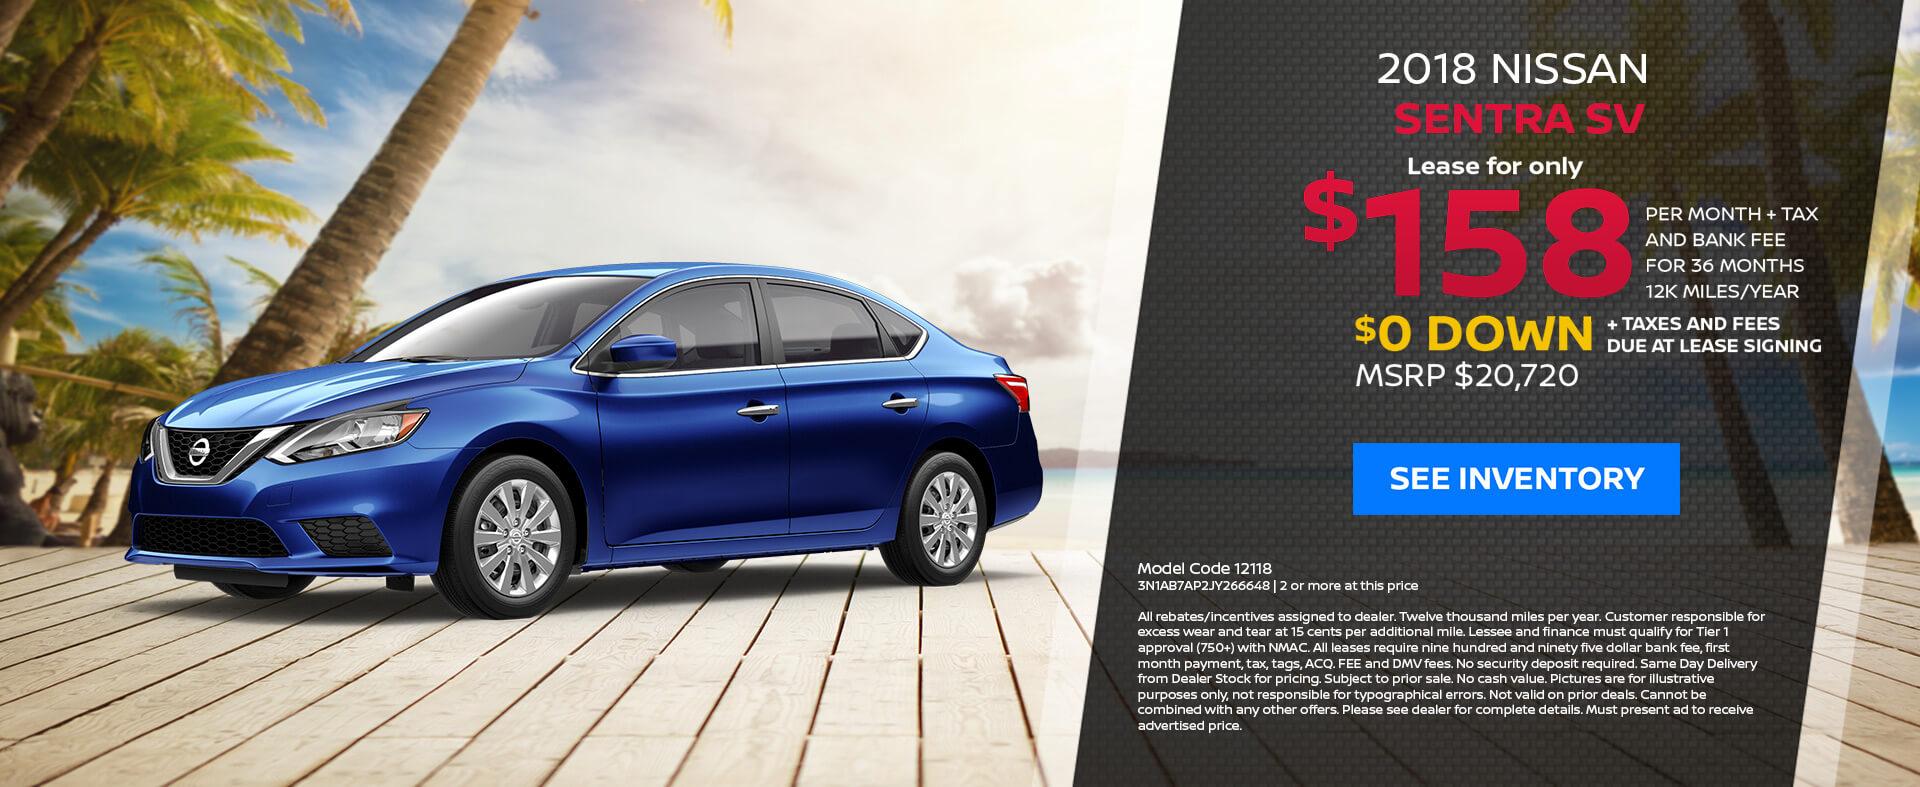 Nissan Sentra $158 Lease